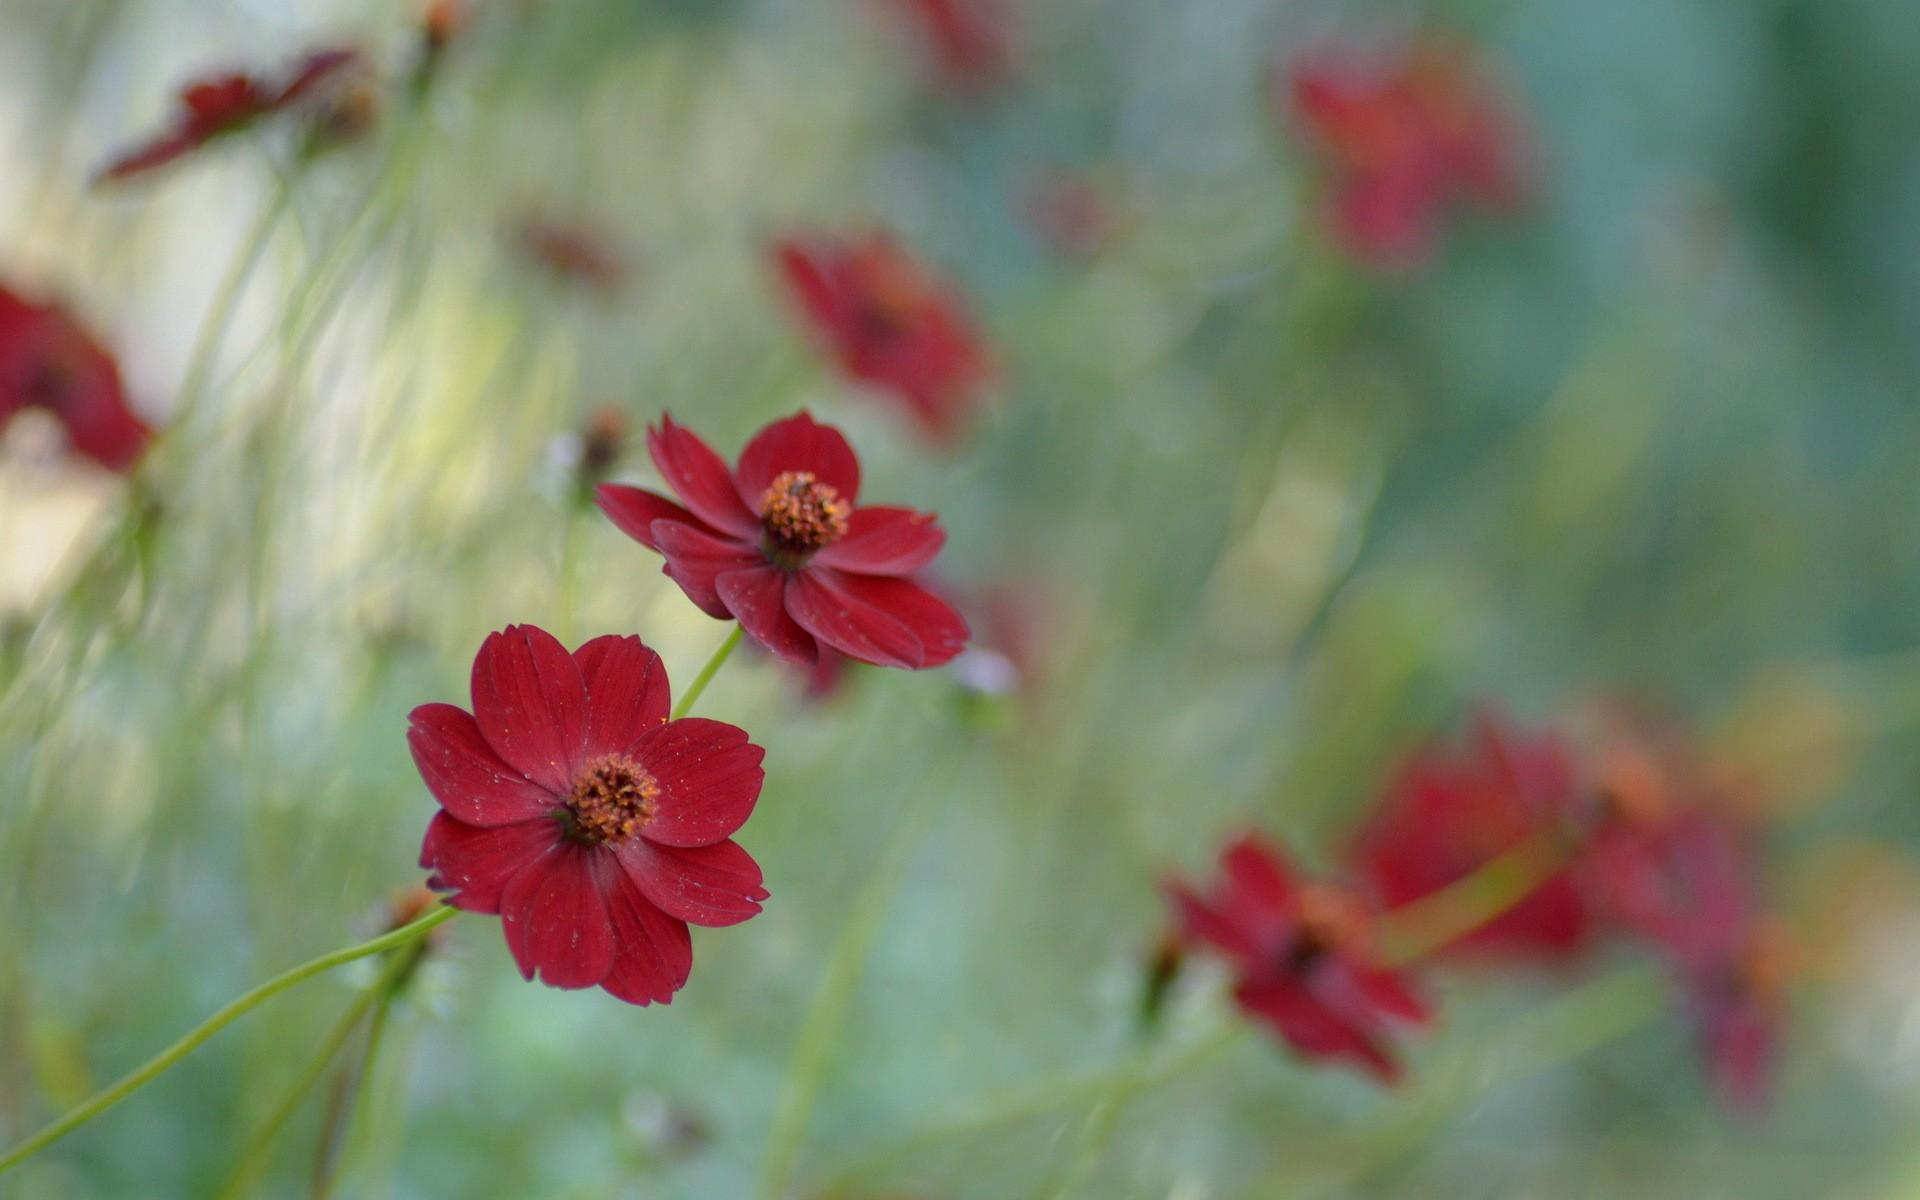 General 1920x1200 plants flowers red flowers